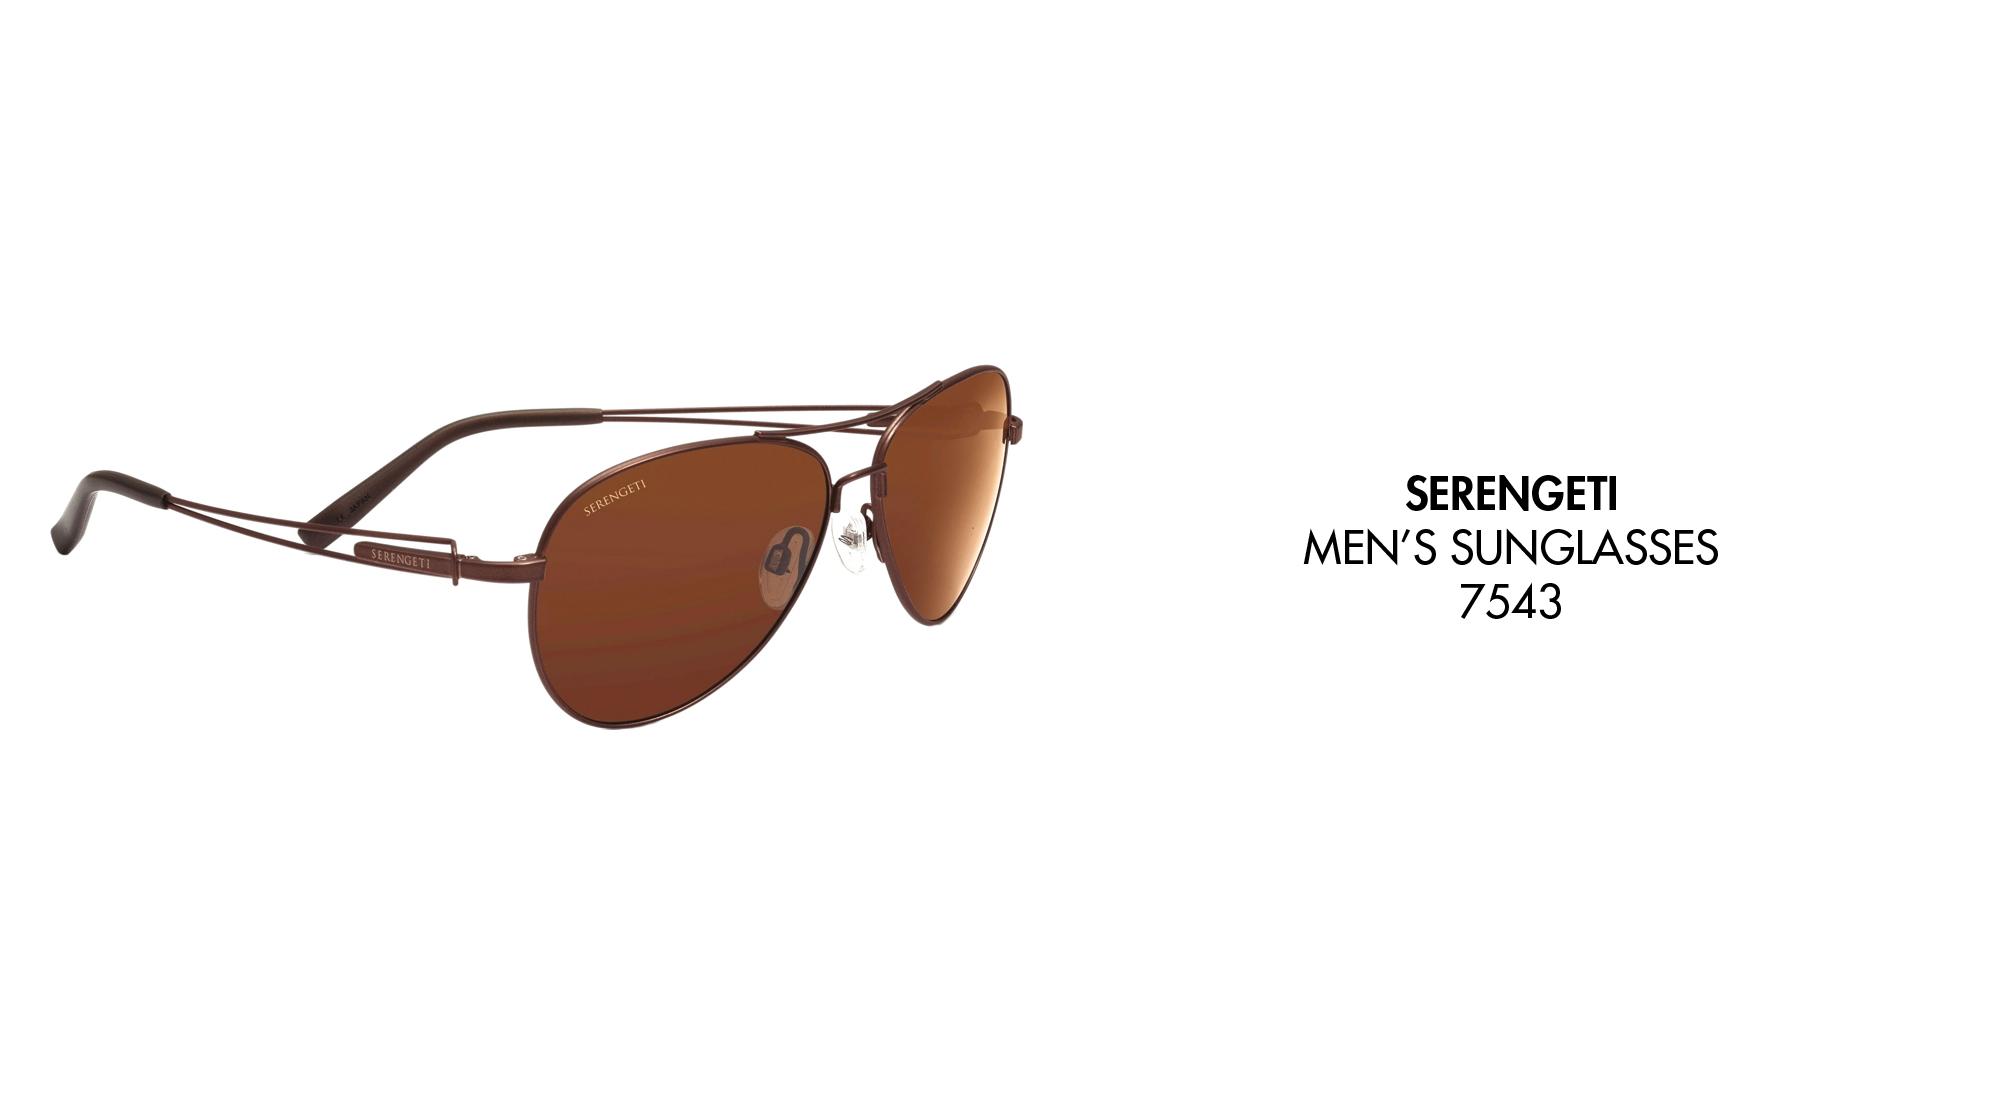 daf2caaf99f2 Serengeti 7665 Sassari Shiny Gunmetal Polarized Drivers Sunglasses- £156